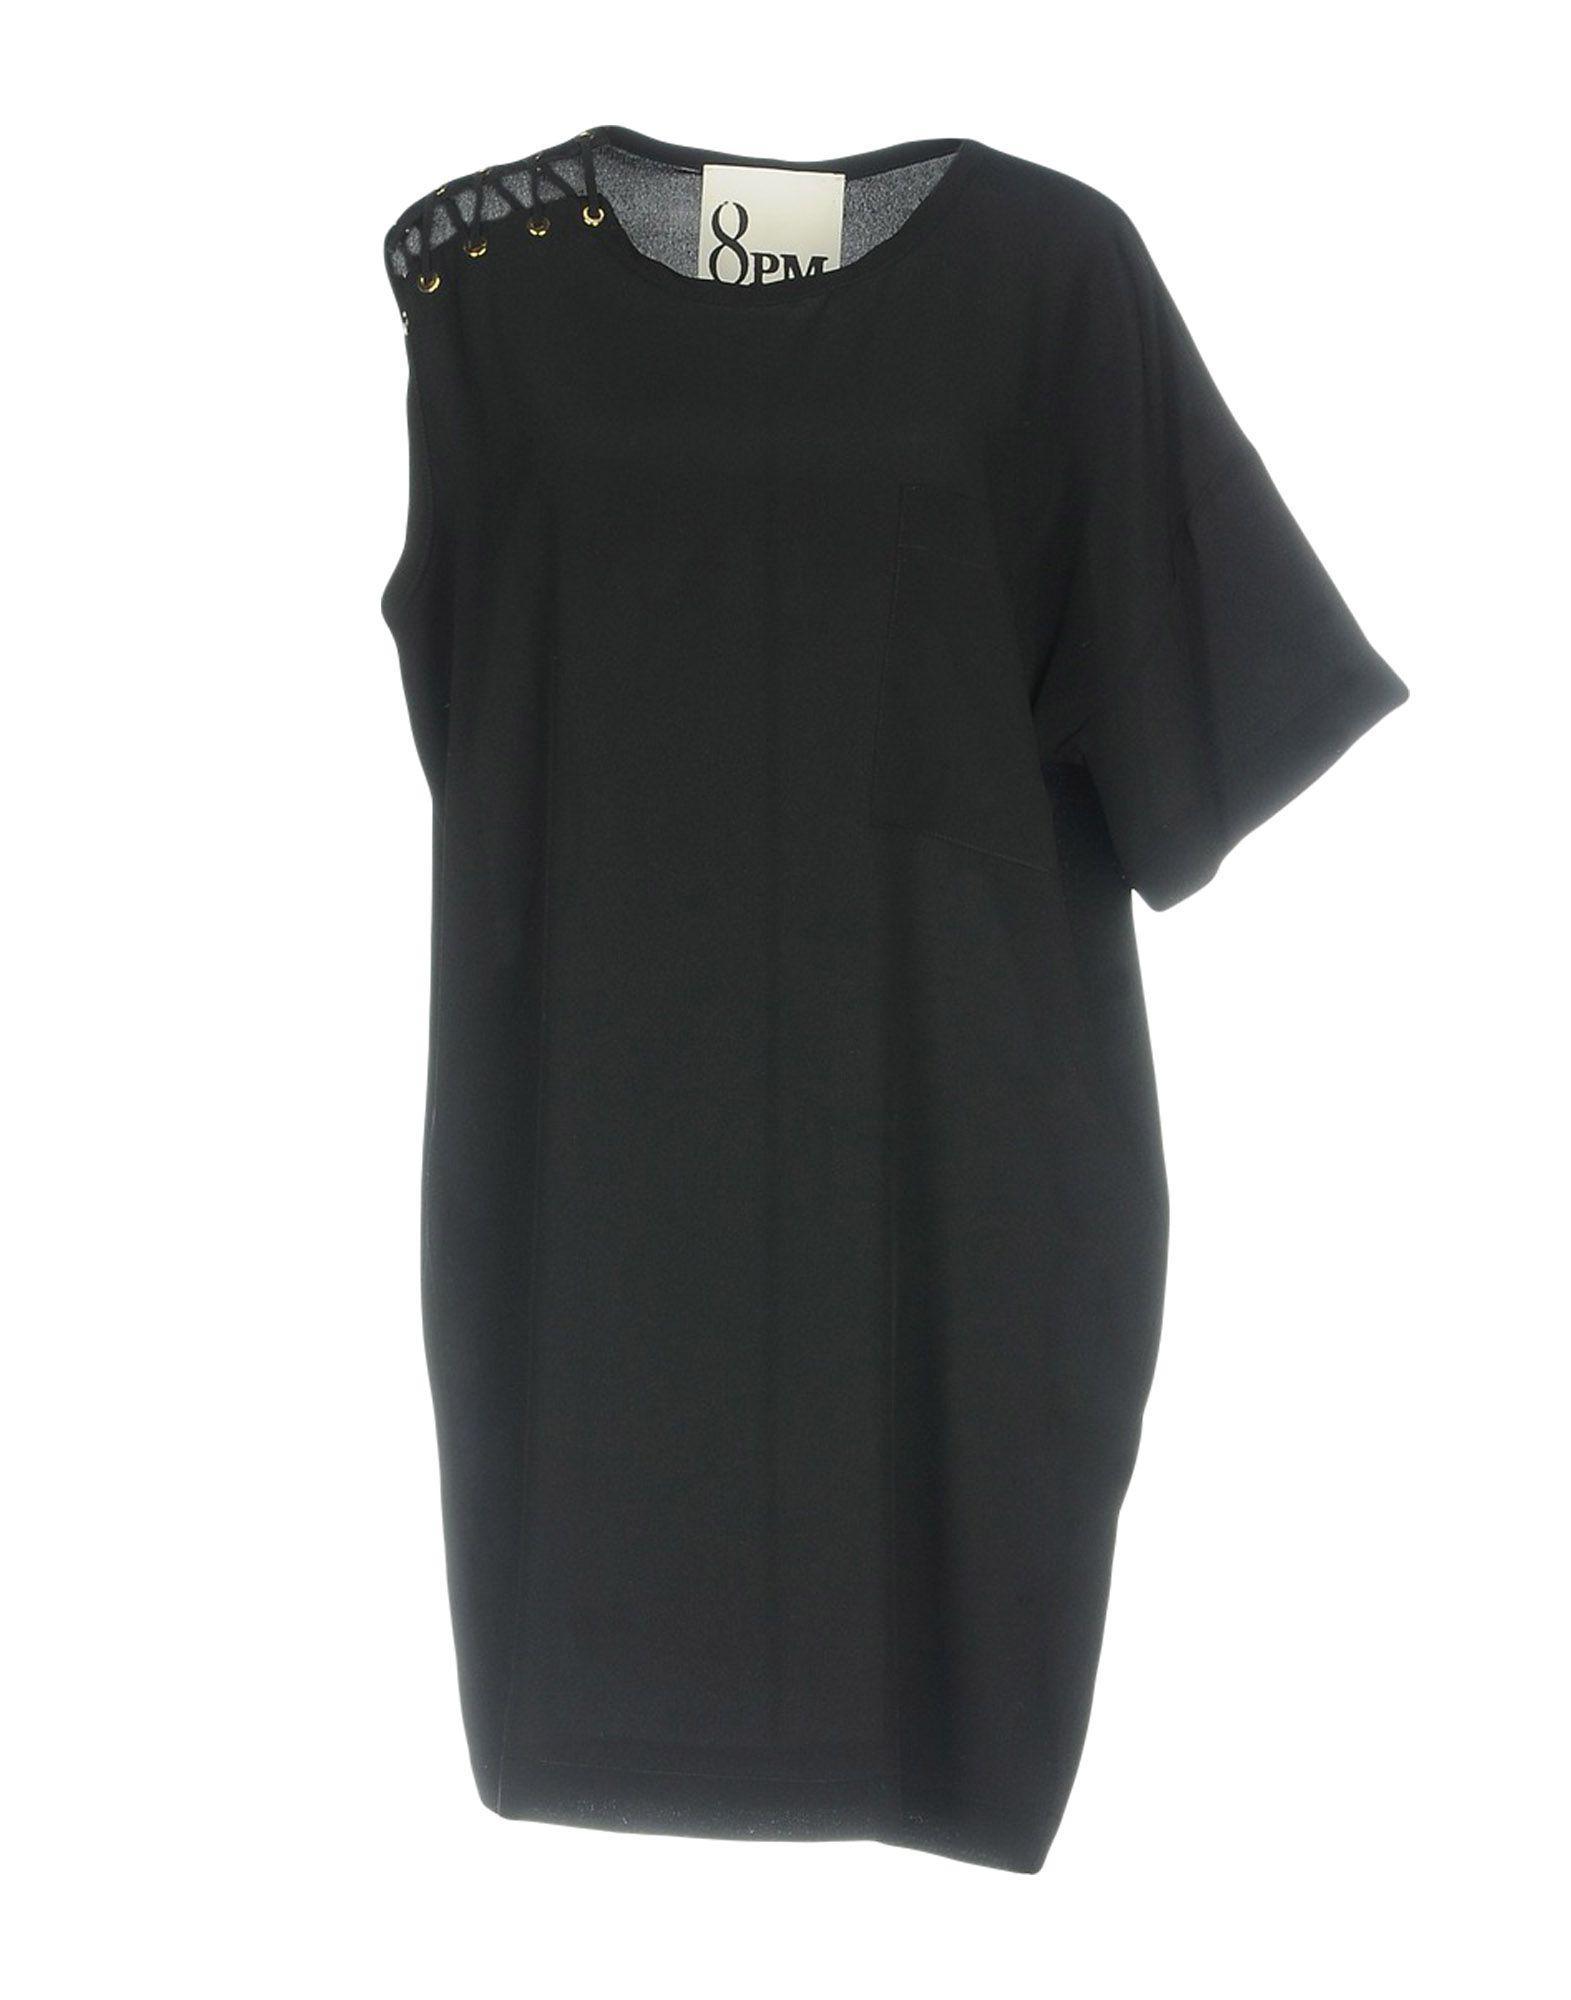 DRESSES - Short dresses 8pm GEub1W